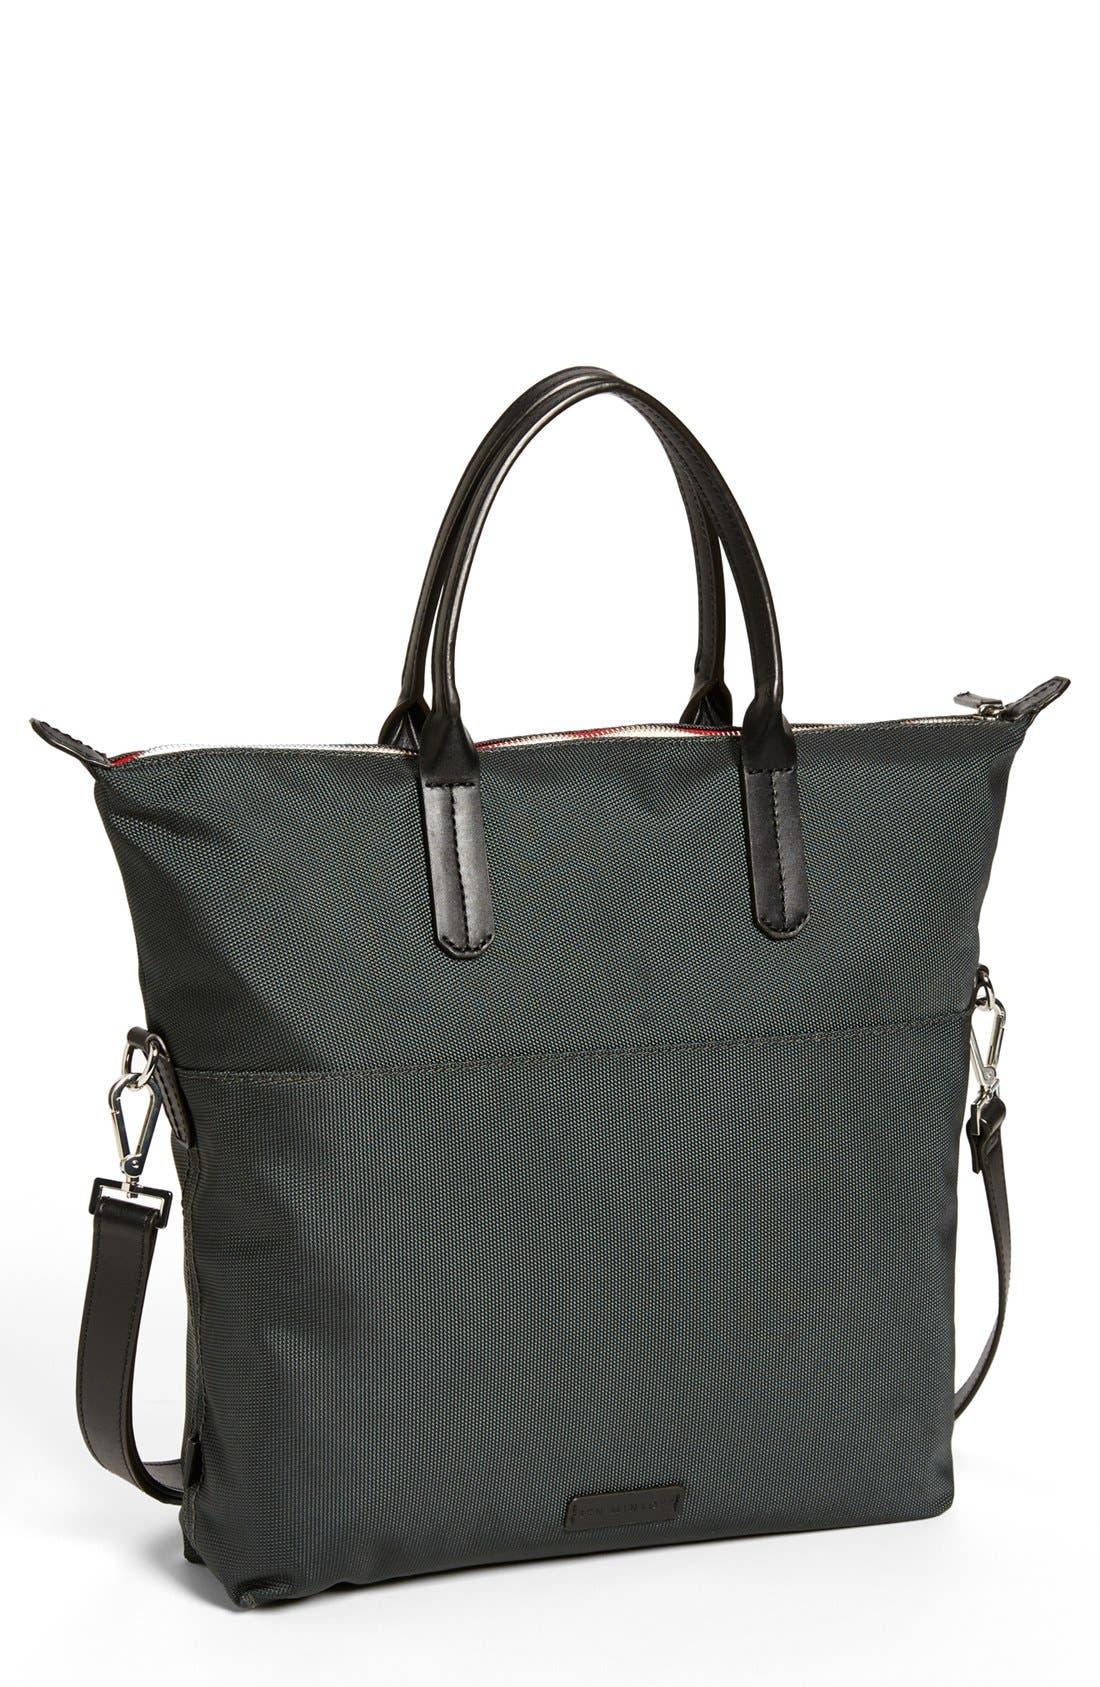 URI MINKOFF Ben Minkoff 'Heath' Tote Bag, Main, color, 020